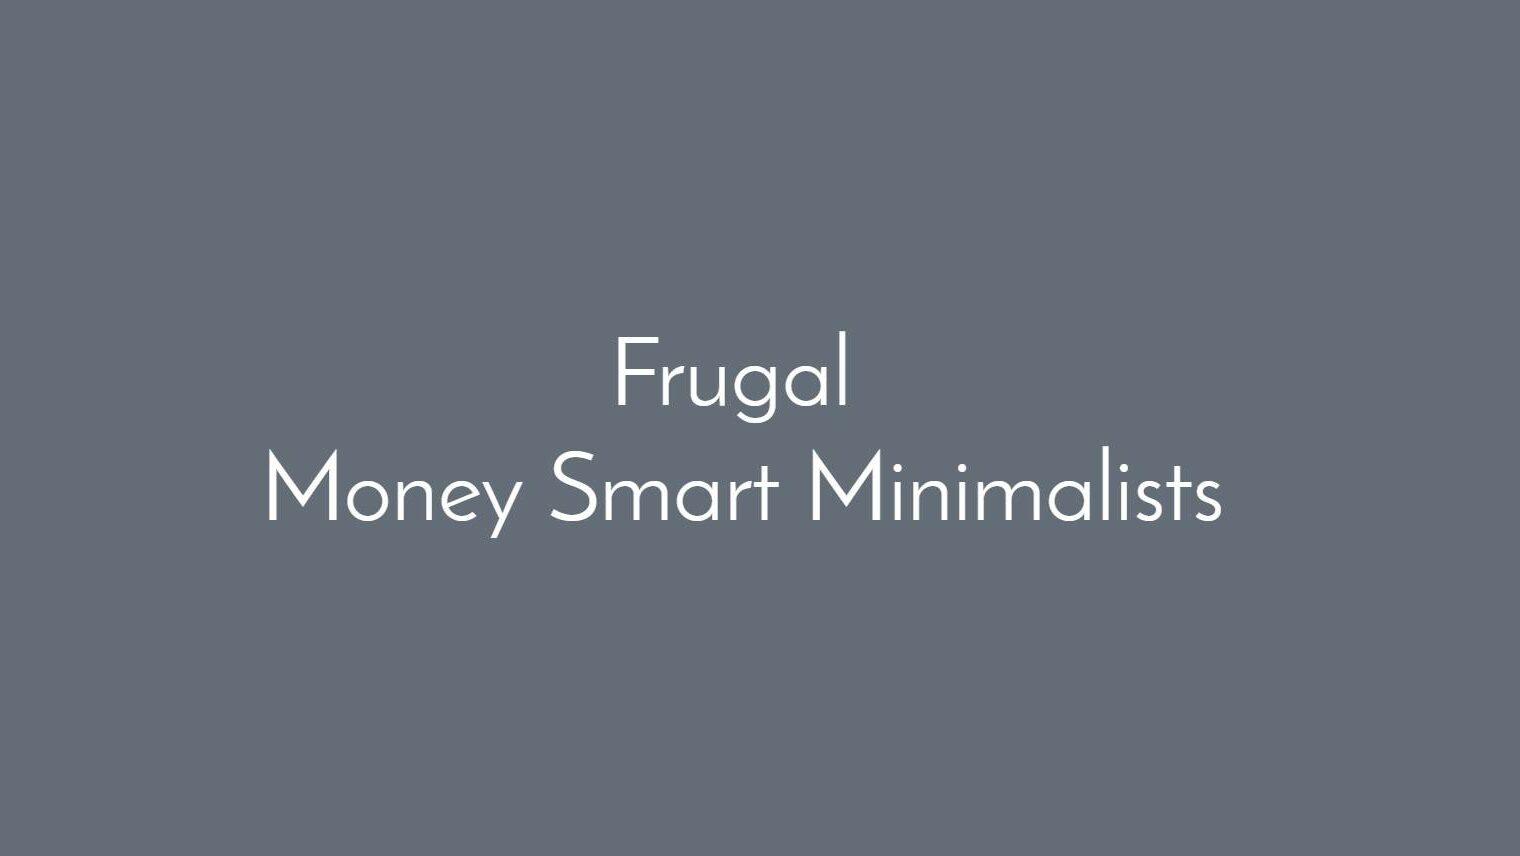 Frugal Money-Smart Minimalists Facebook group